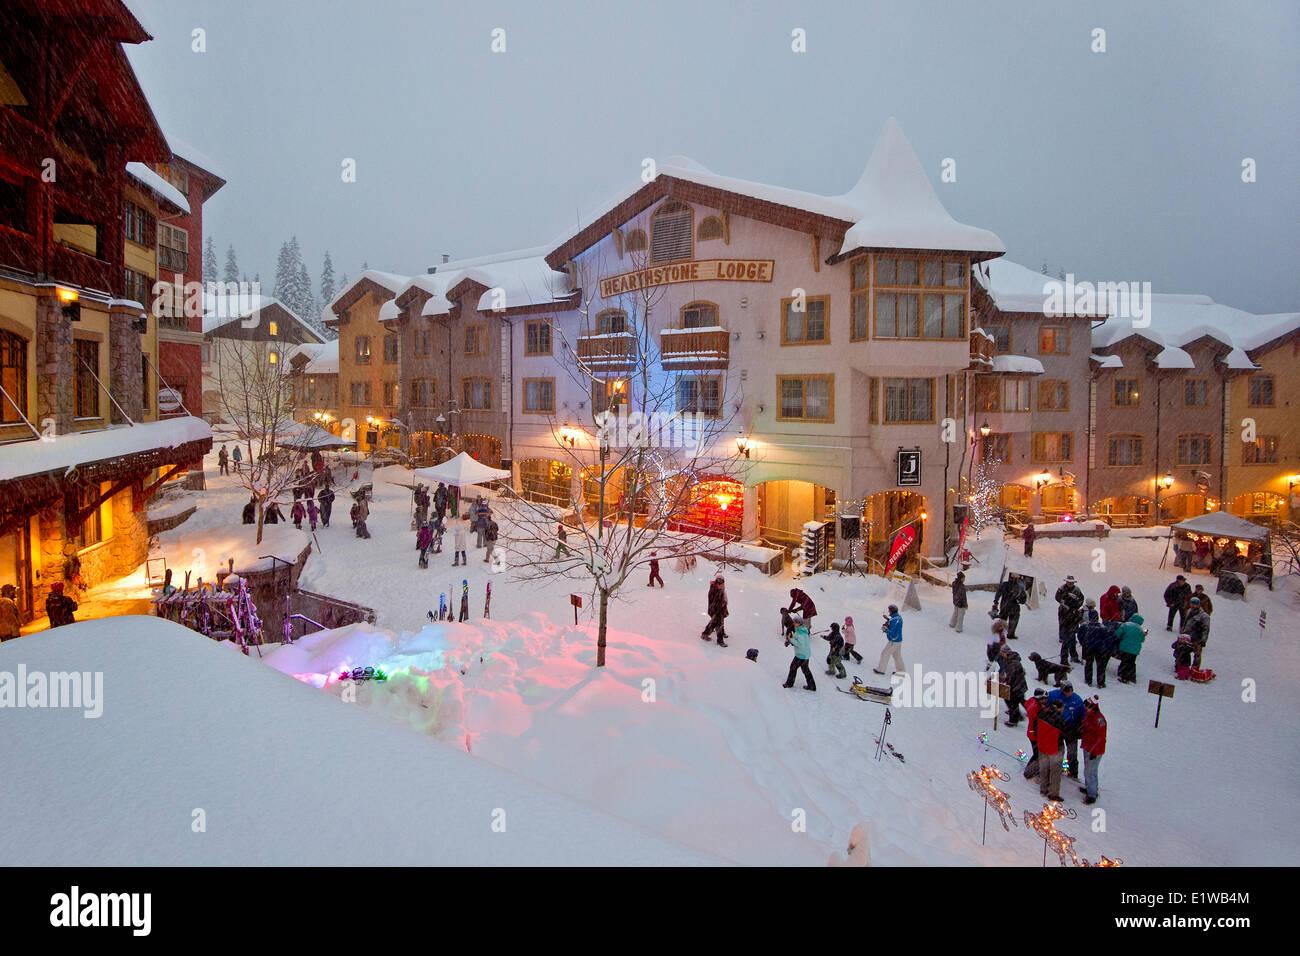 Holiday festivities at Sun Peaks Resort, Sun Peaks, British Columbia, Thompson Okanagan region, Canada. - Stock Image